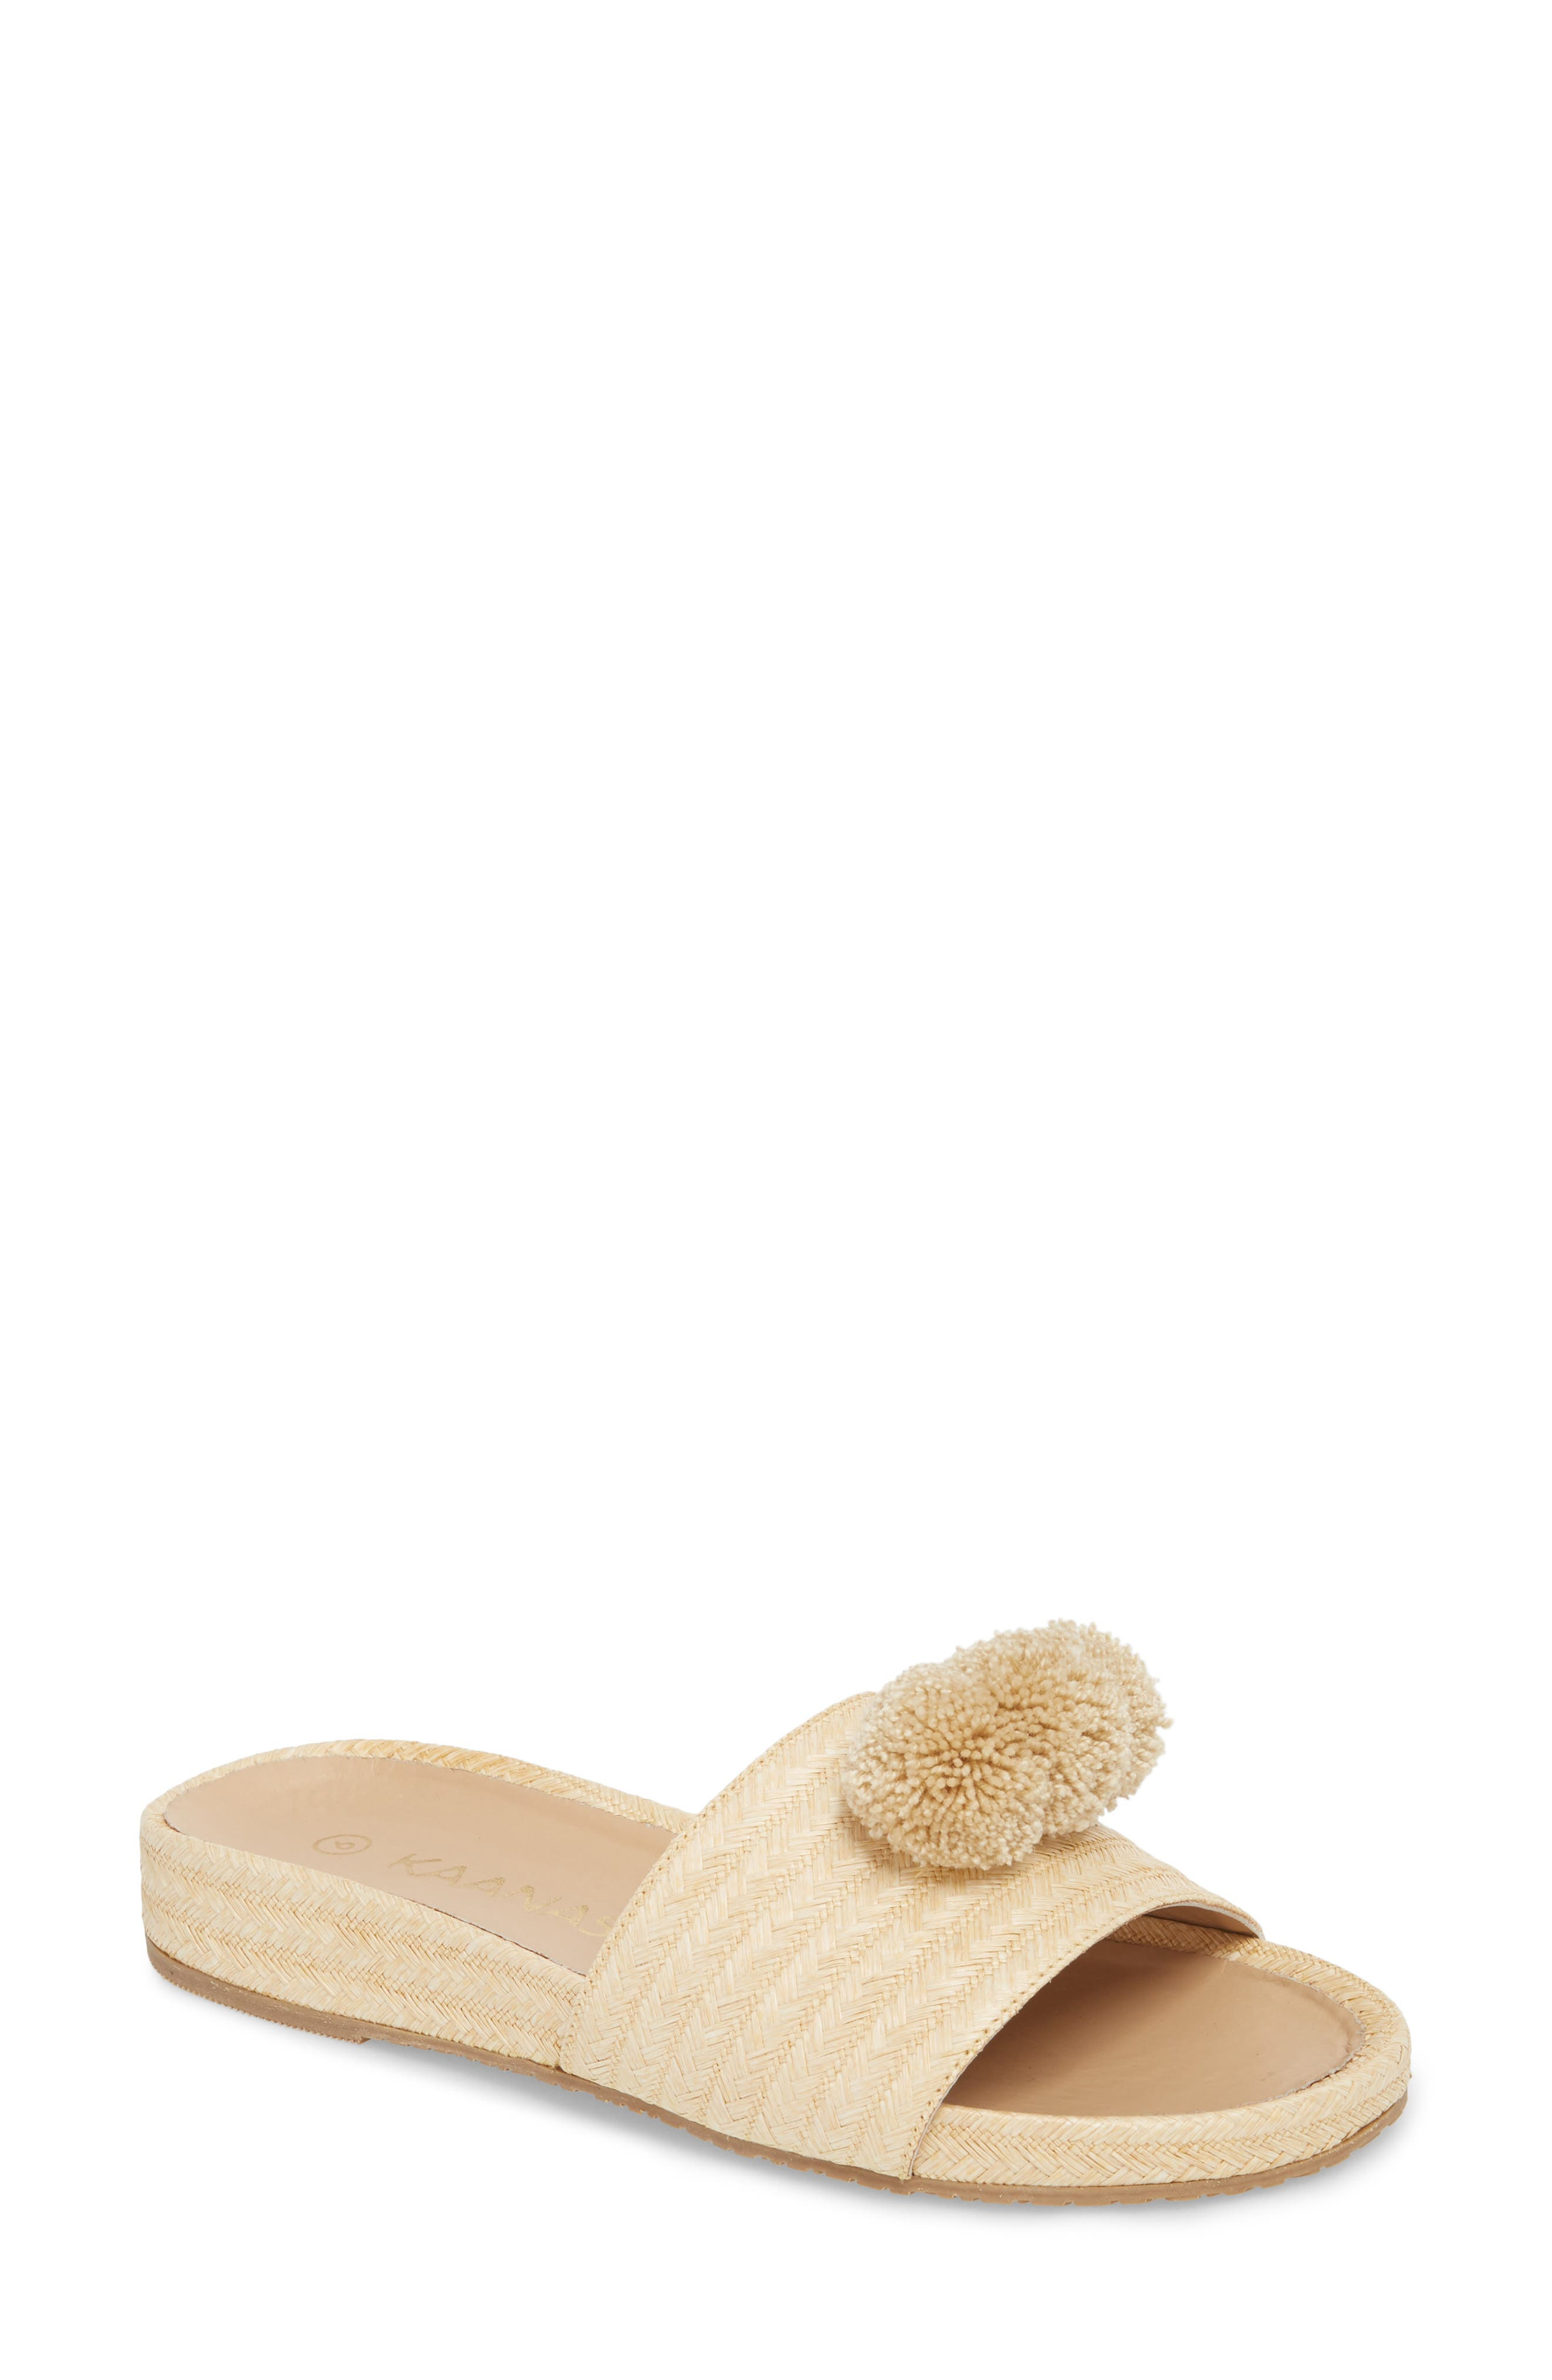 Santa Cruz Pom Slide Sandal,                             Main thumbnail 1, color,                             020